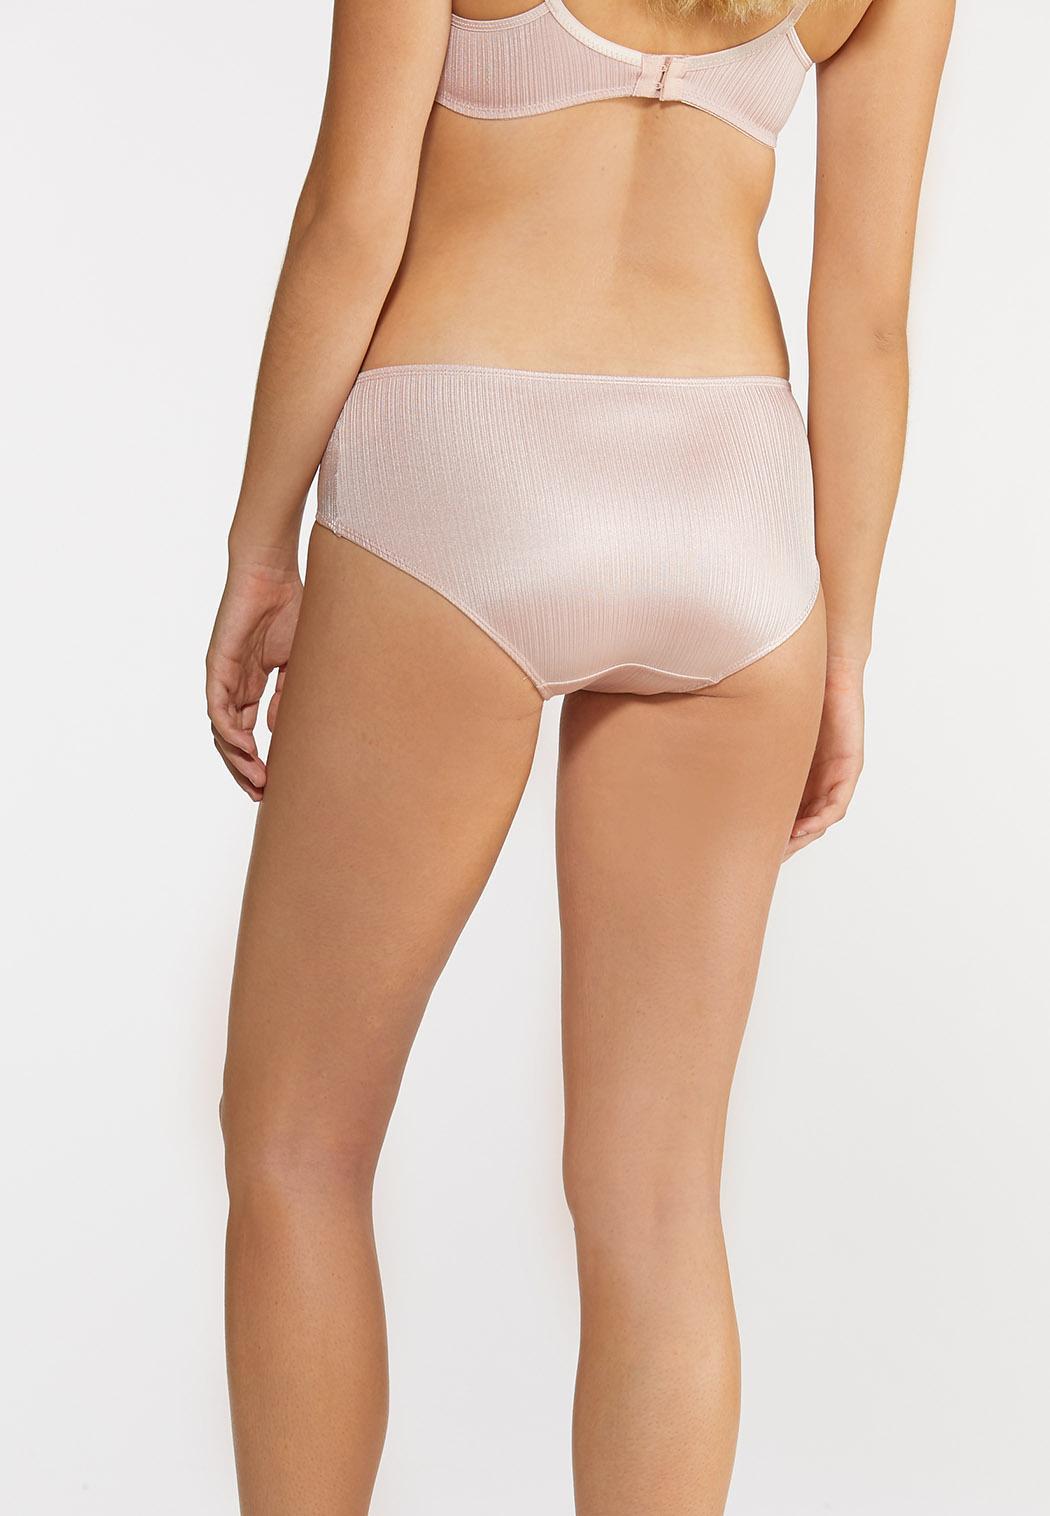 Plus Size Silky Stripe Panty Set (Item #43925663)